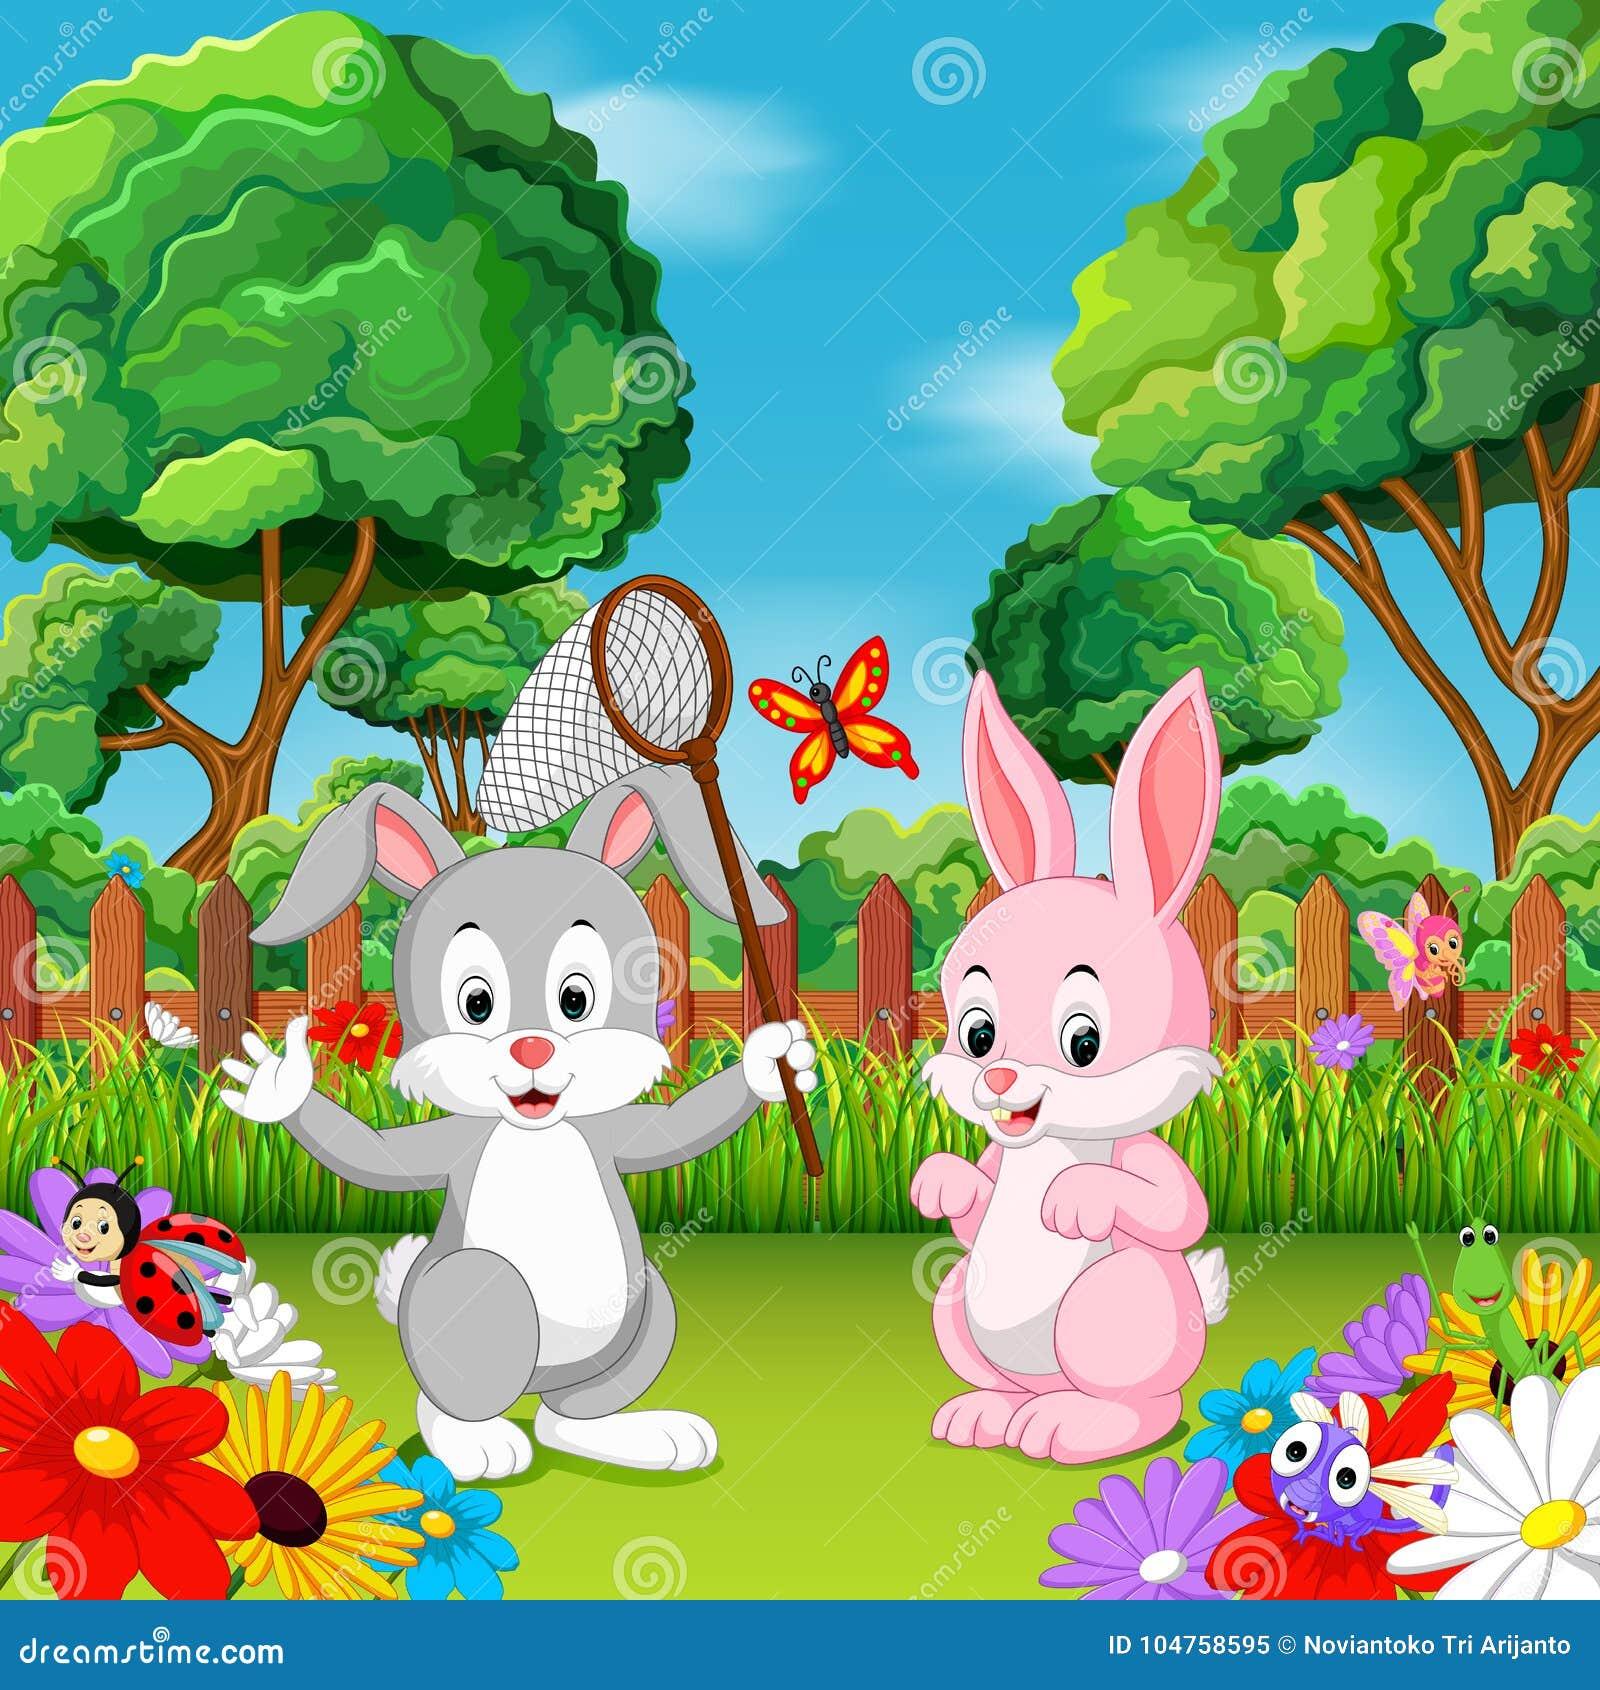 Cartoon Couples Stock Illustrations – 2,621 Cartoon Couples